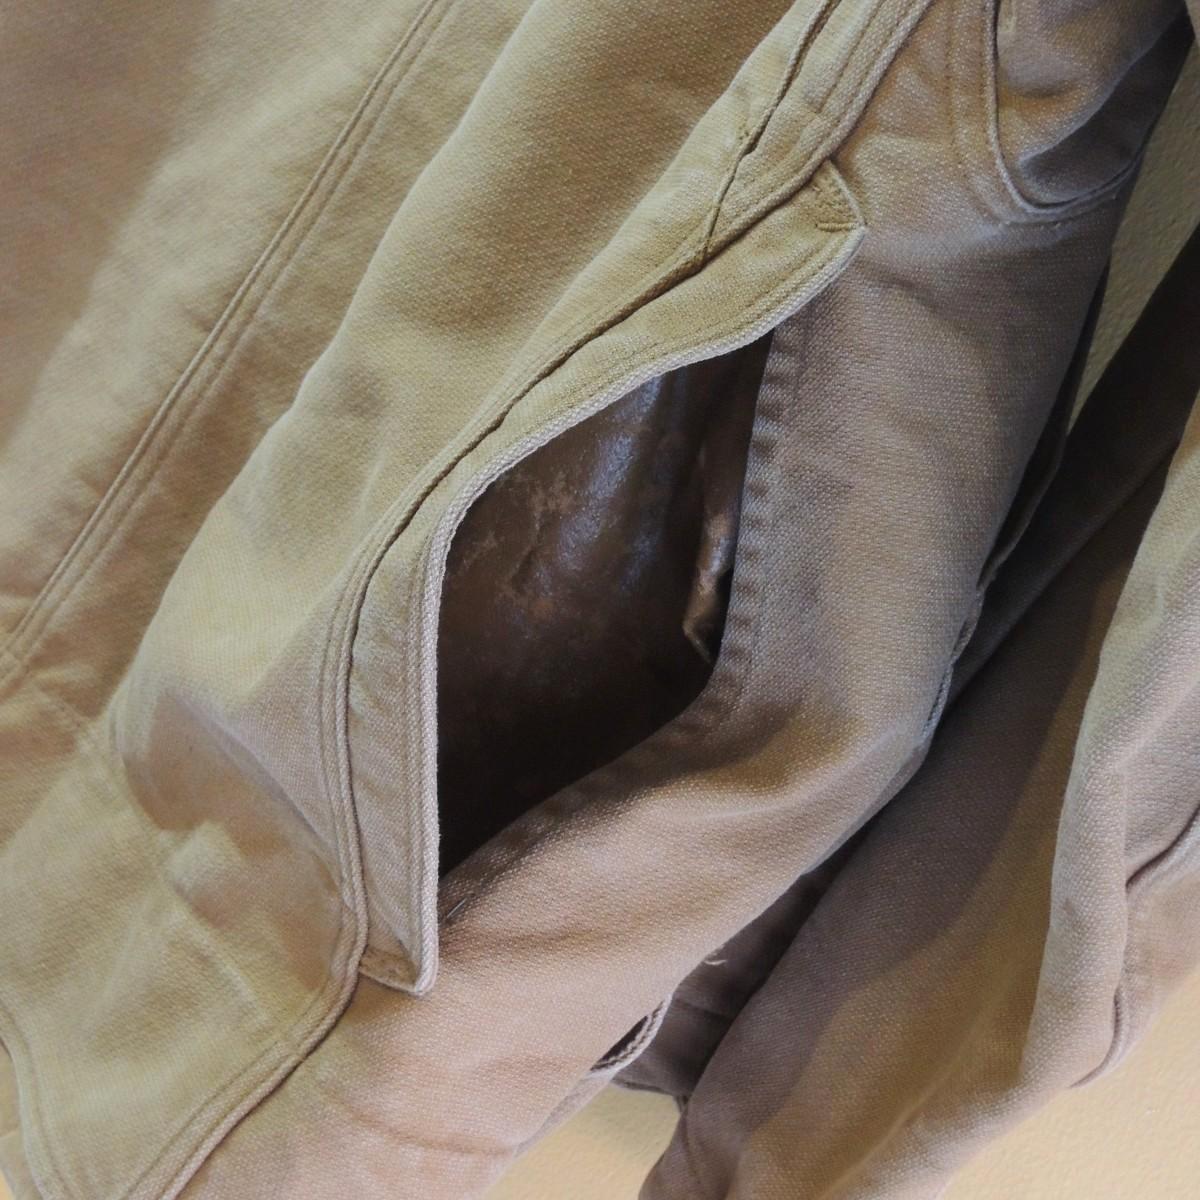 westernfieldmontgomerywardhuntinngjacket011.JPG